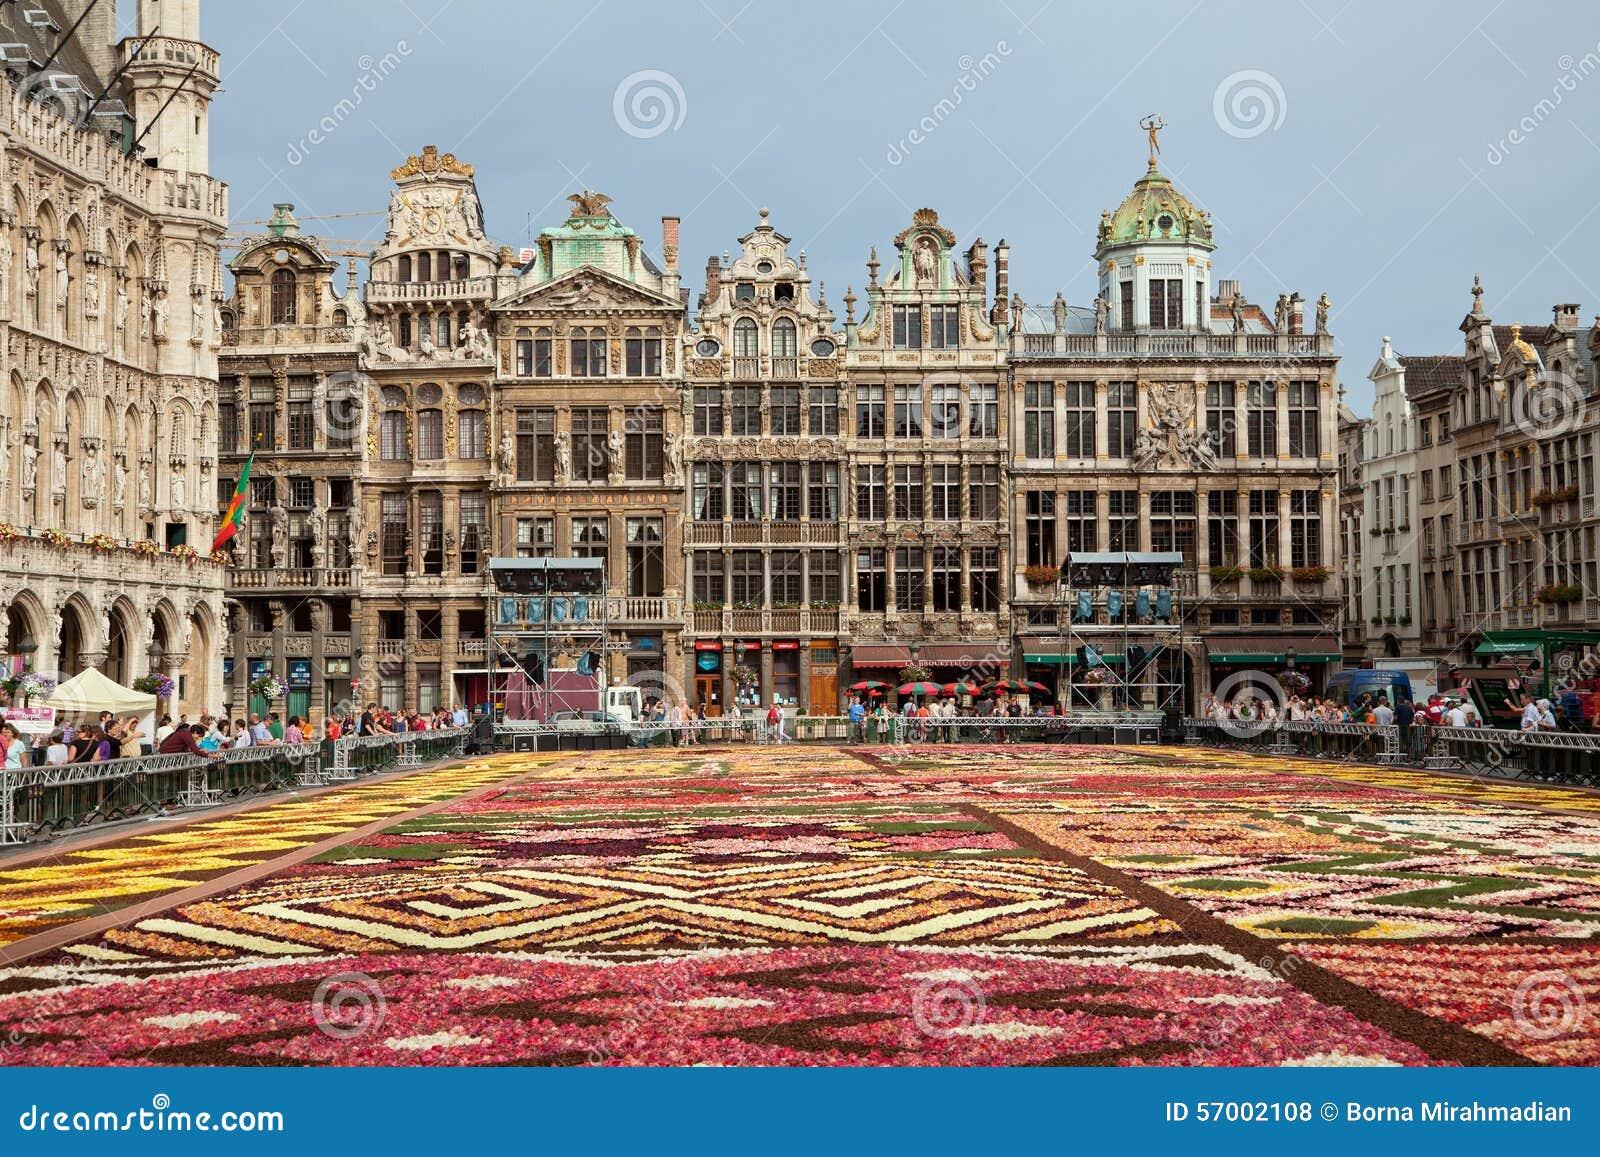 Tappeto Floreale Bruxelles : Tappeto floreale bruxelles tappeto floreale bruxelles tappeto di